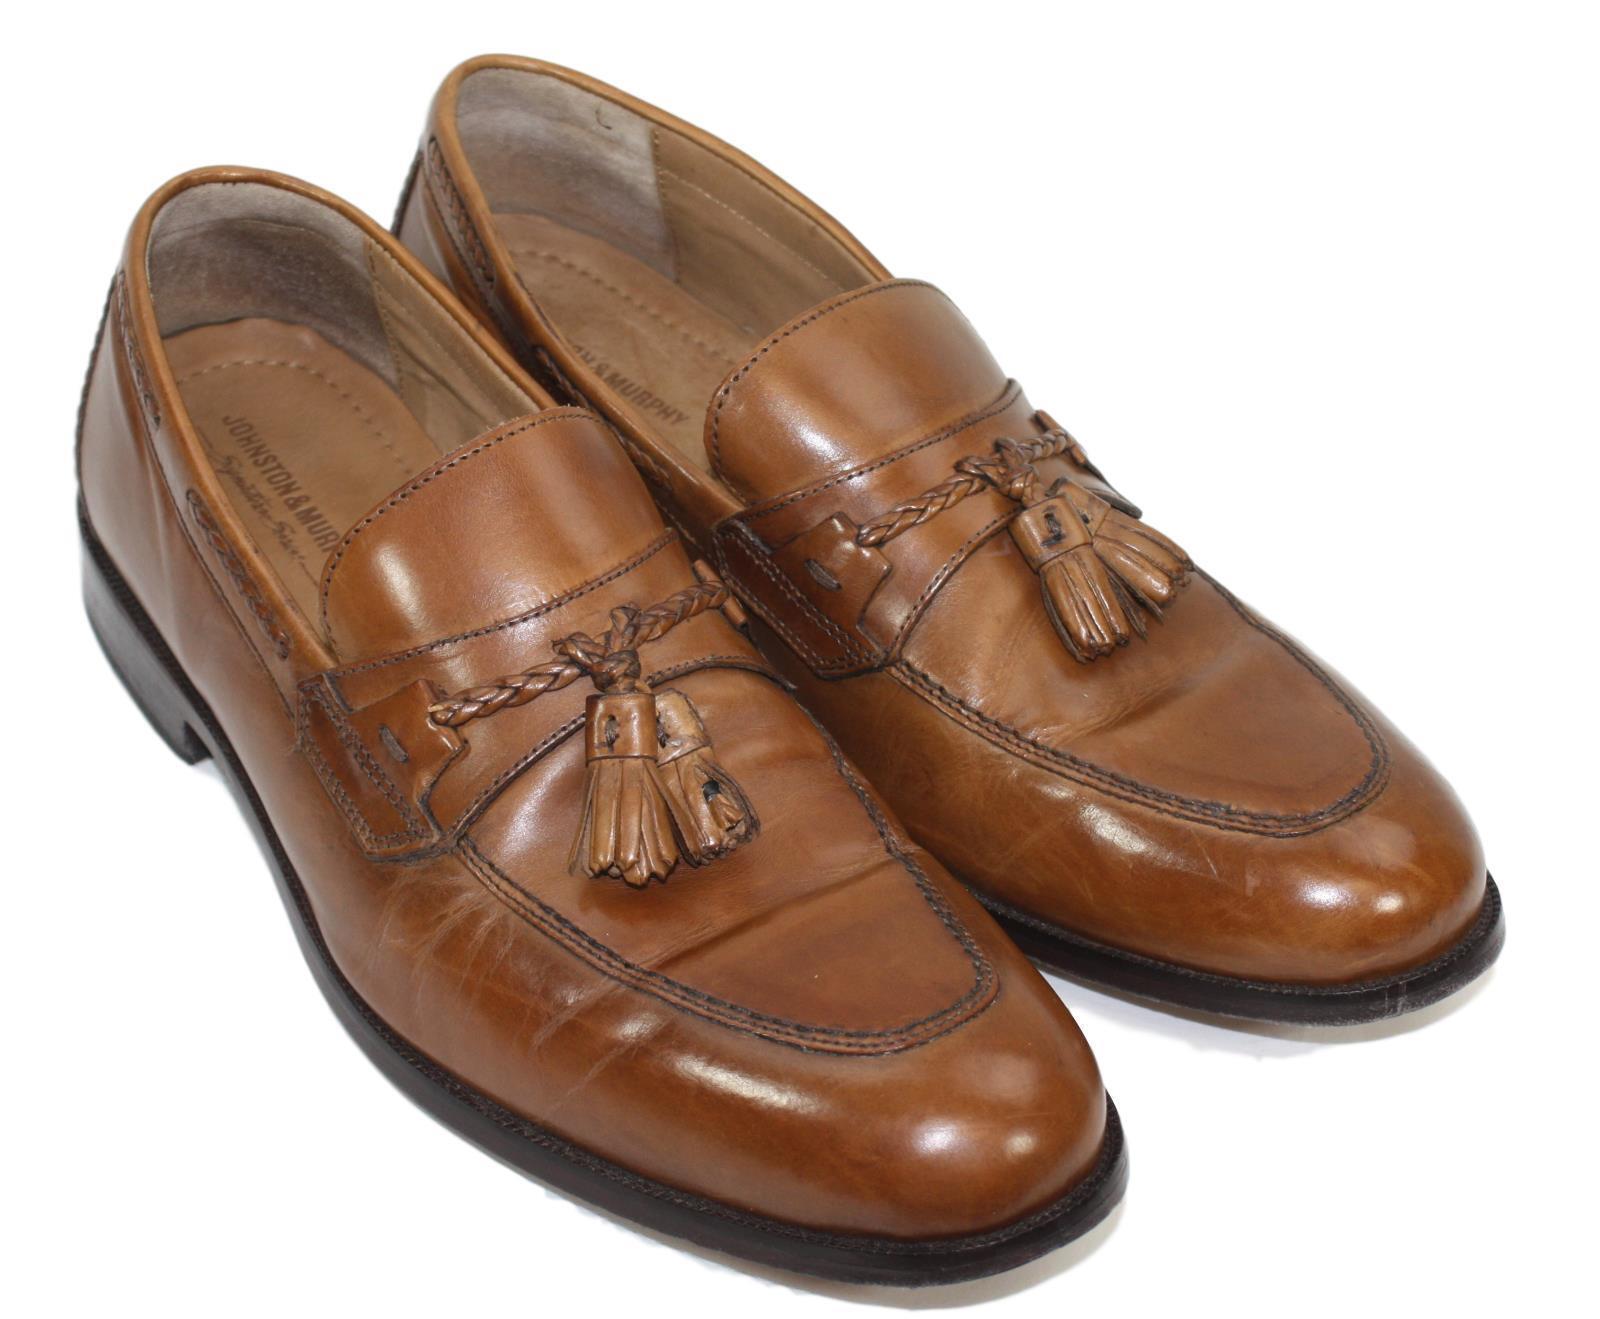 Johnston & Murphy Mens braun Slip On Loafers schuhe Größe 11M